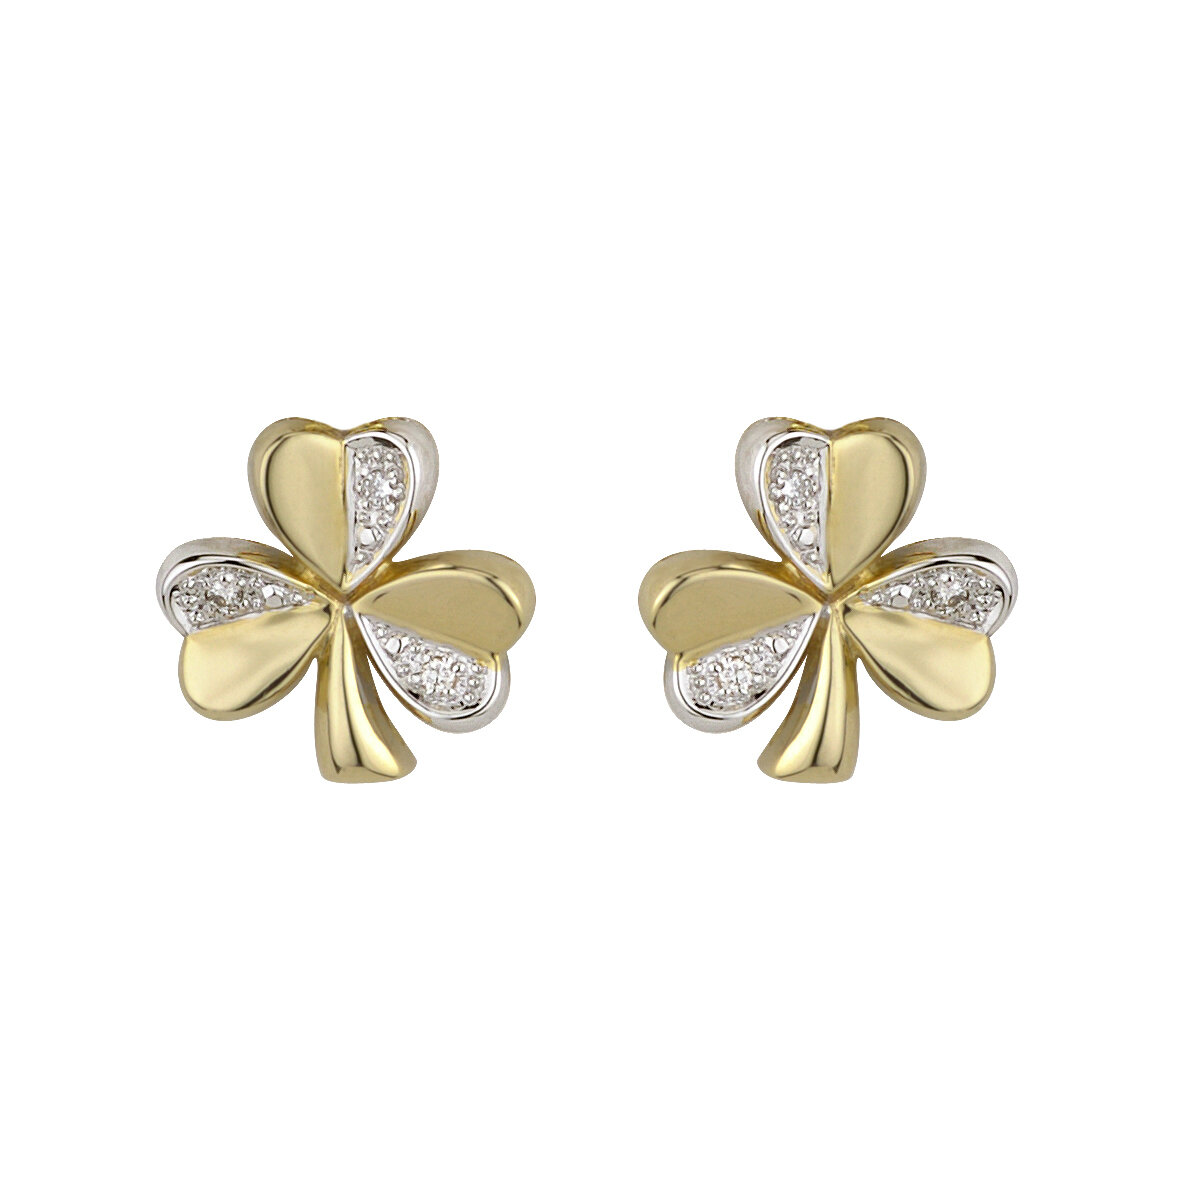 14K two tone gold diamond shamrock stud earrings s3124 from Solvar